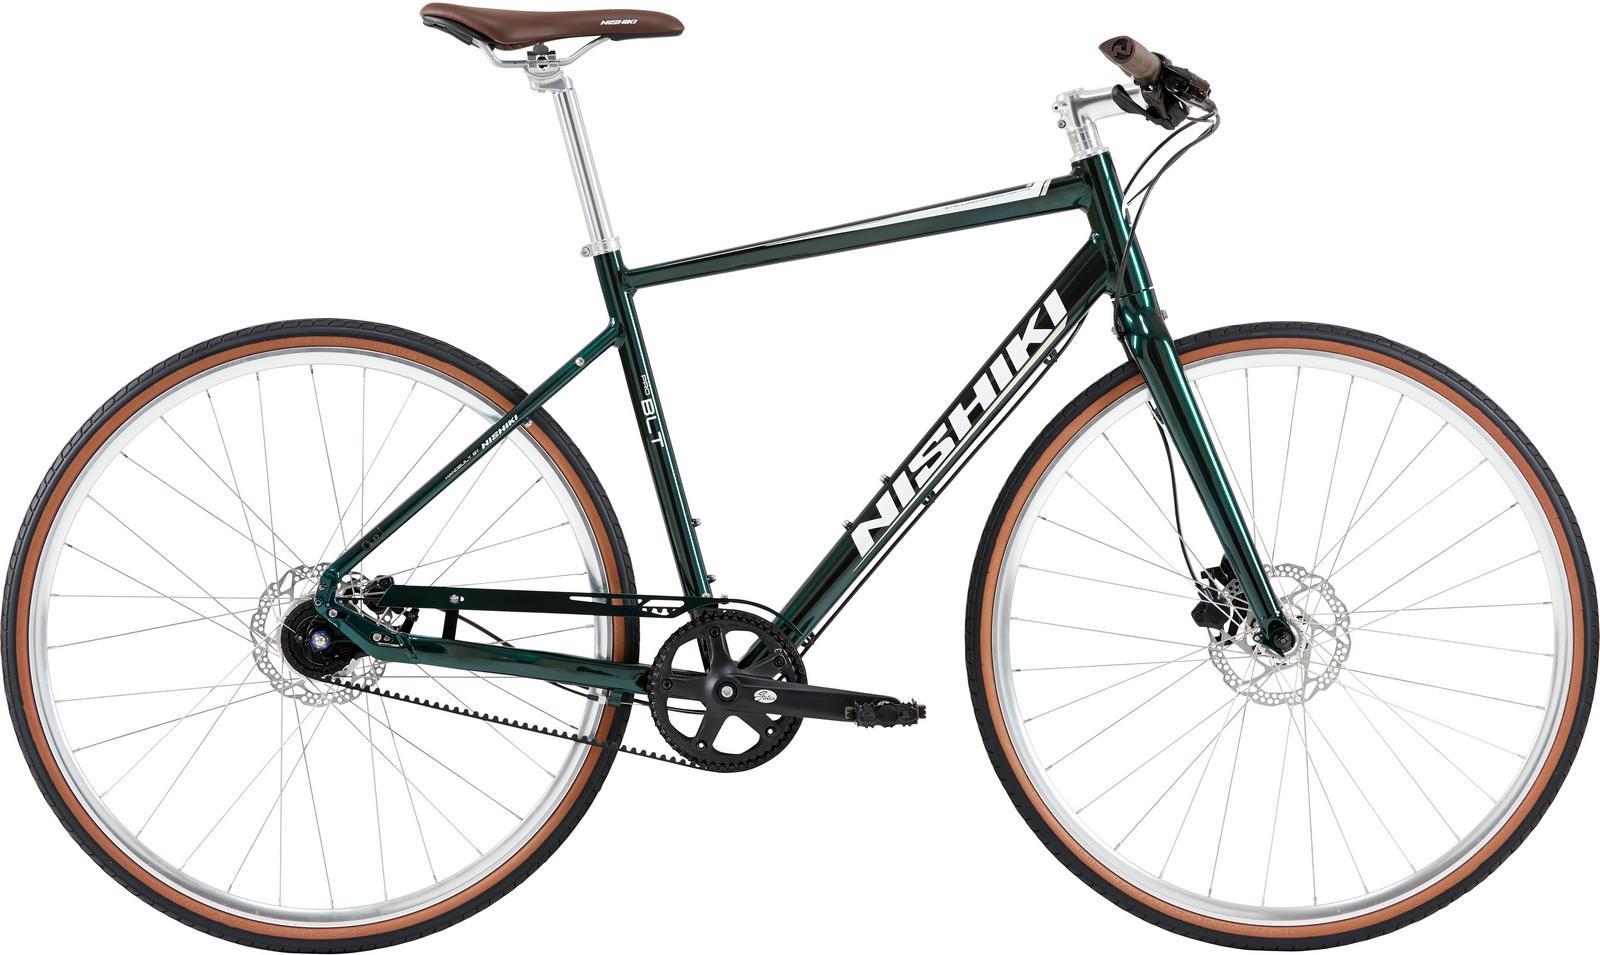 Nishiki Pro Blt, Herre sportscykel, 2019, Grøn | City-cykler